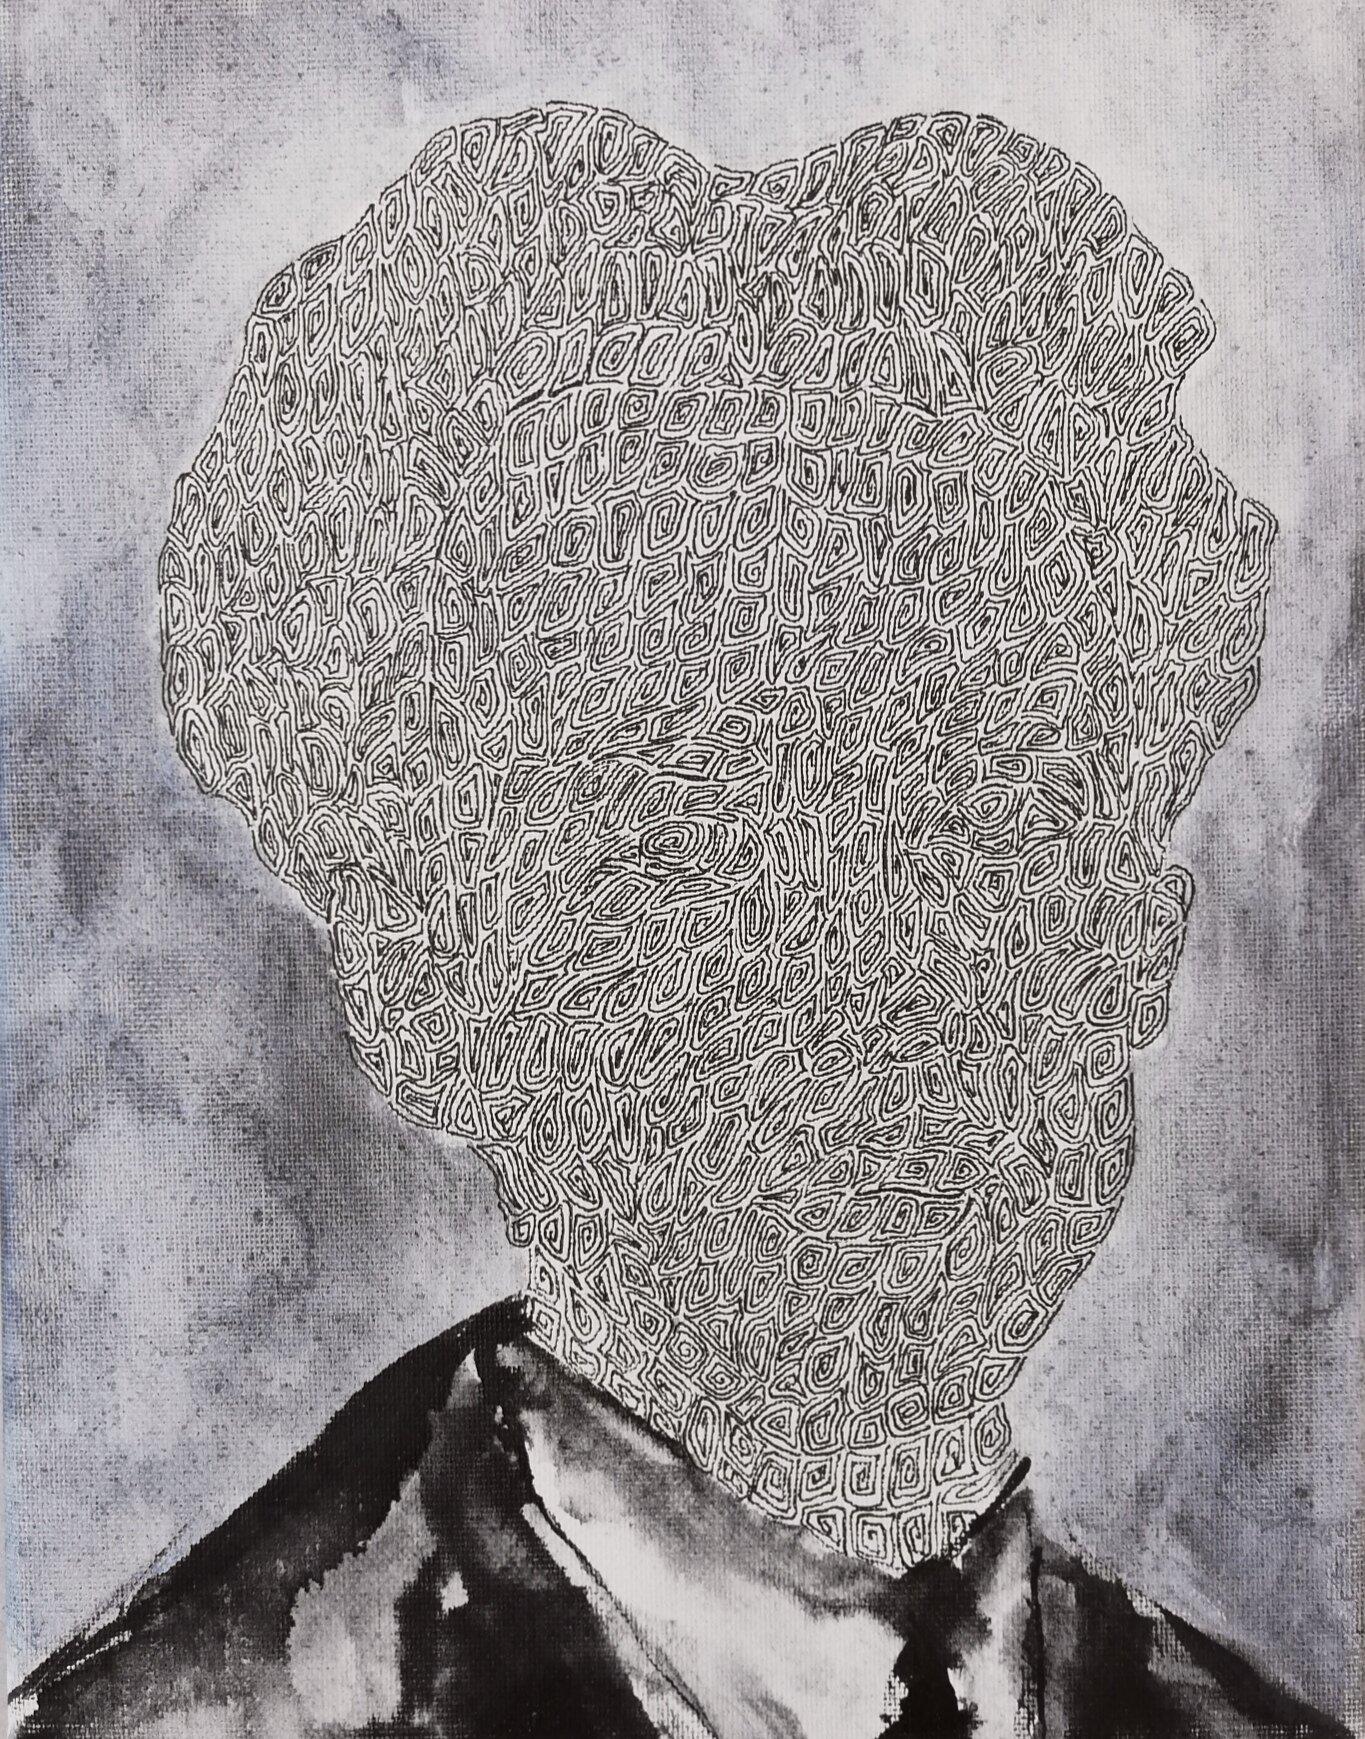 SANF059 Naoki Fuku_No Longer Human(Akutagawa)_Ink, acrylic, watercolor and brush pen on canvas_18x24cm_2019.jpg